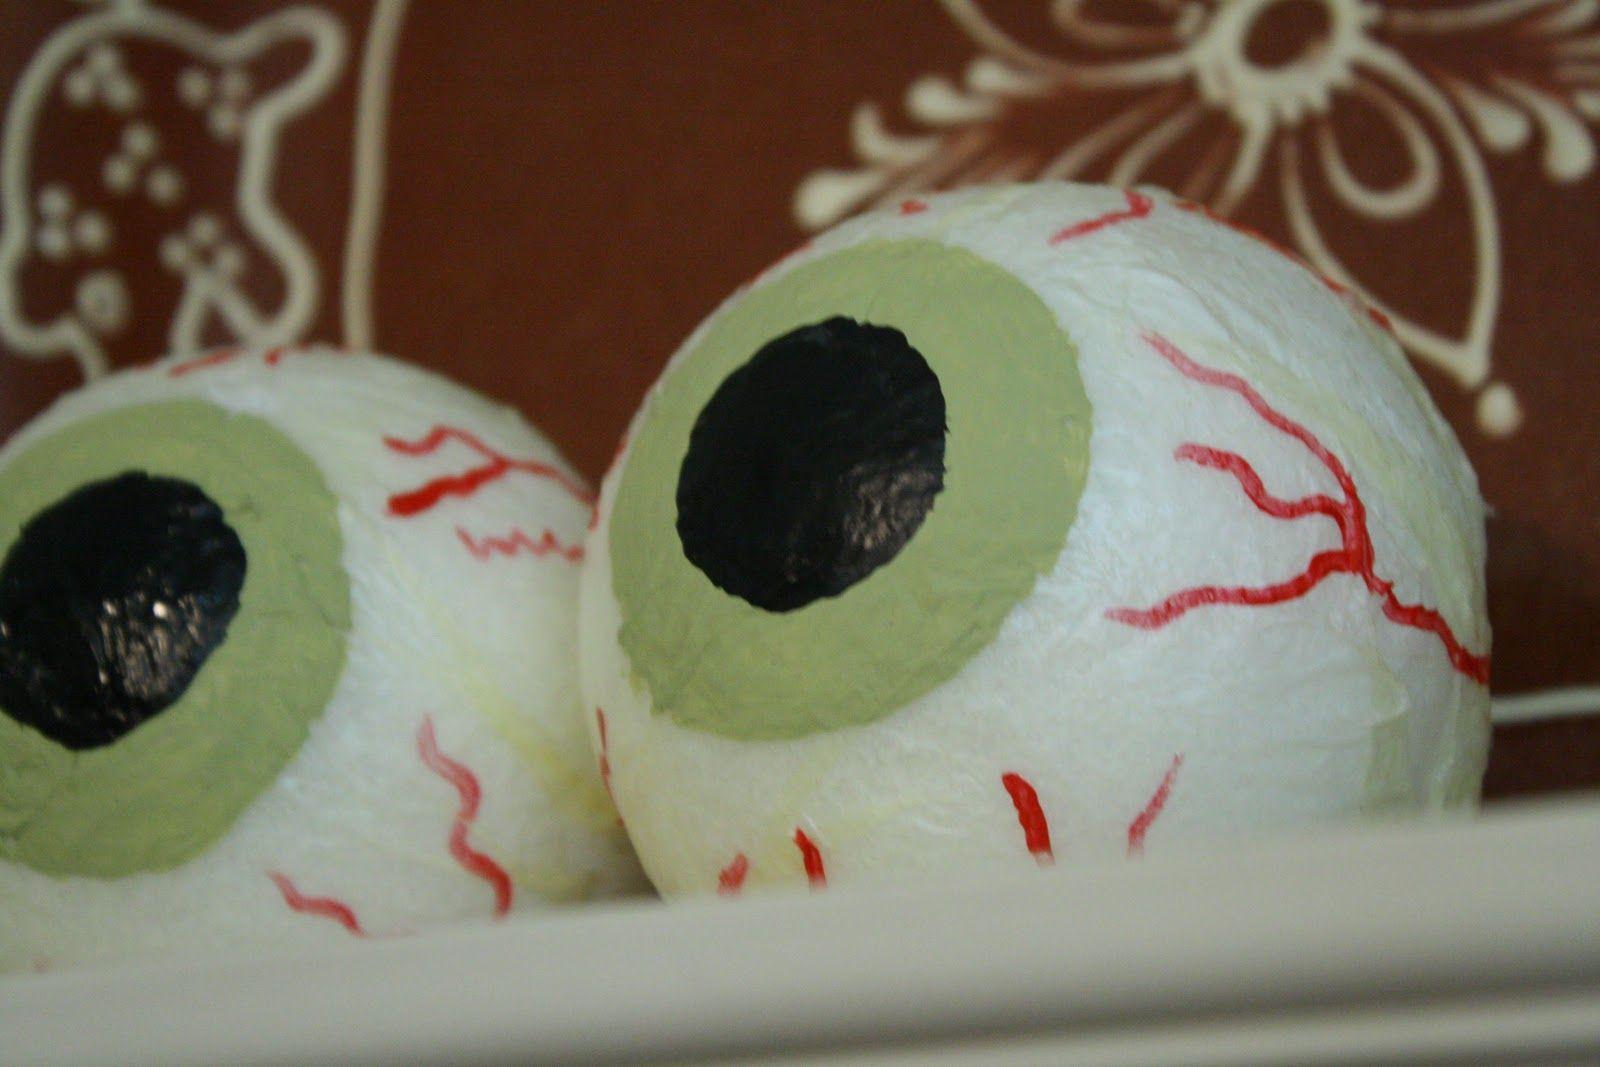 Diy Styrofoam Eyeballs Halloween Eyeballs Halloween Diy Crafts Halloween Crafts